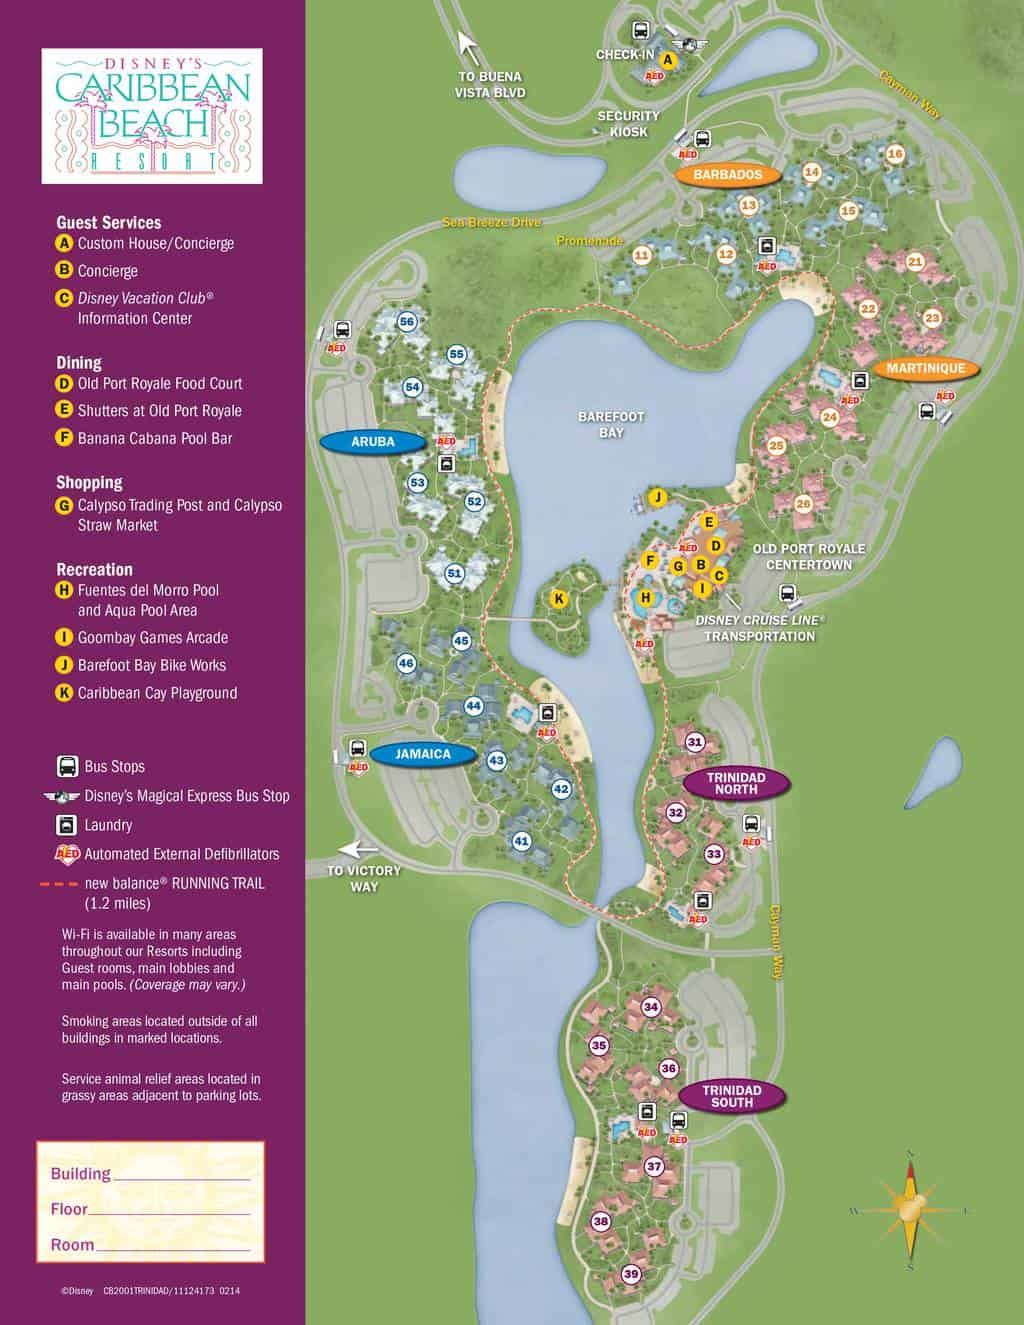 Caribbean Beach Resort Map KennythePiratecom